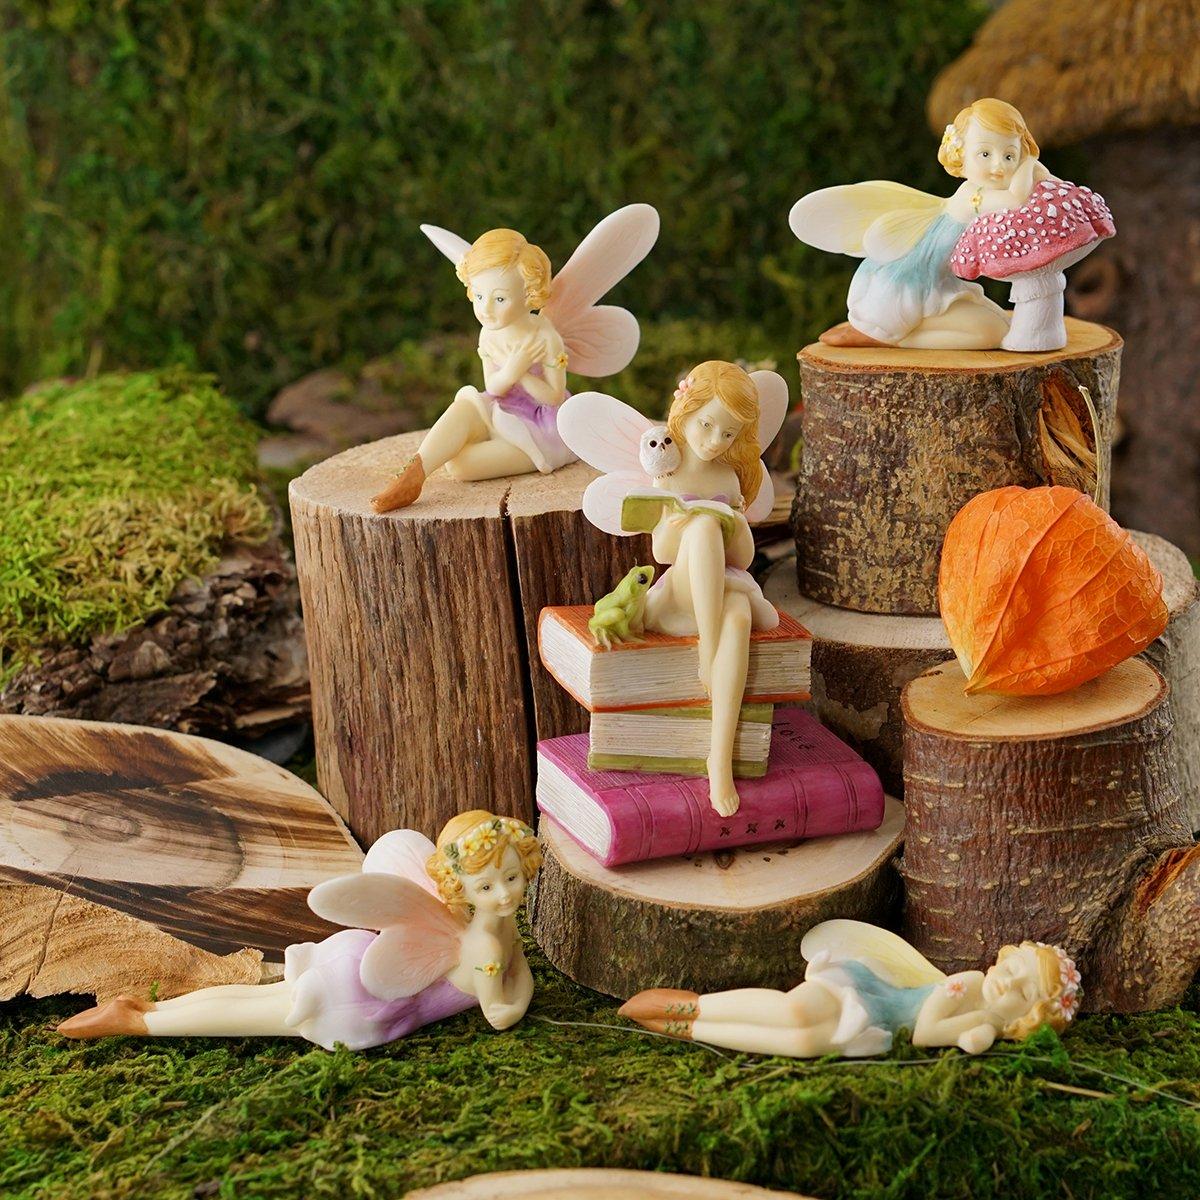 Top Collection Miniature Garden and Terrarium Flower Fairy Resting on Mushroom Figurine